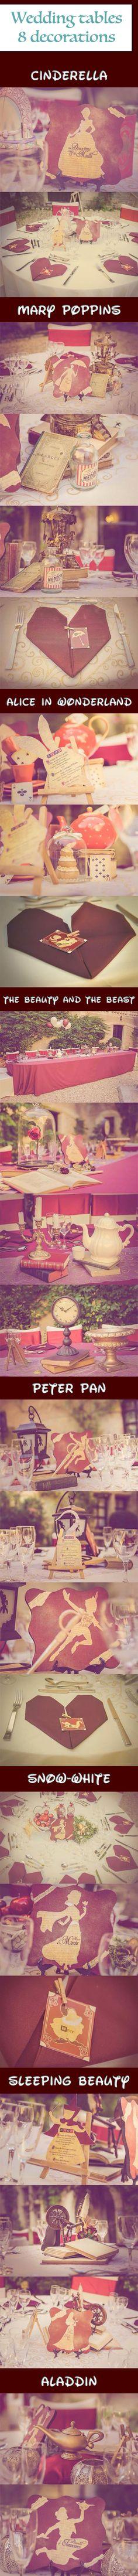 French Disney Wedding tables decorations - Chroniques Disney Facebook